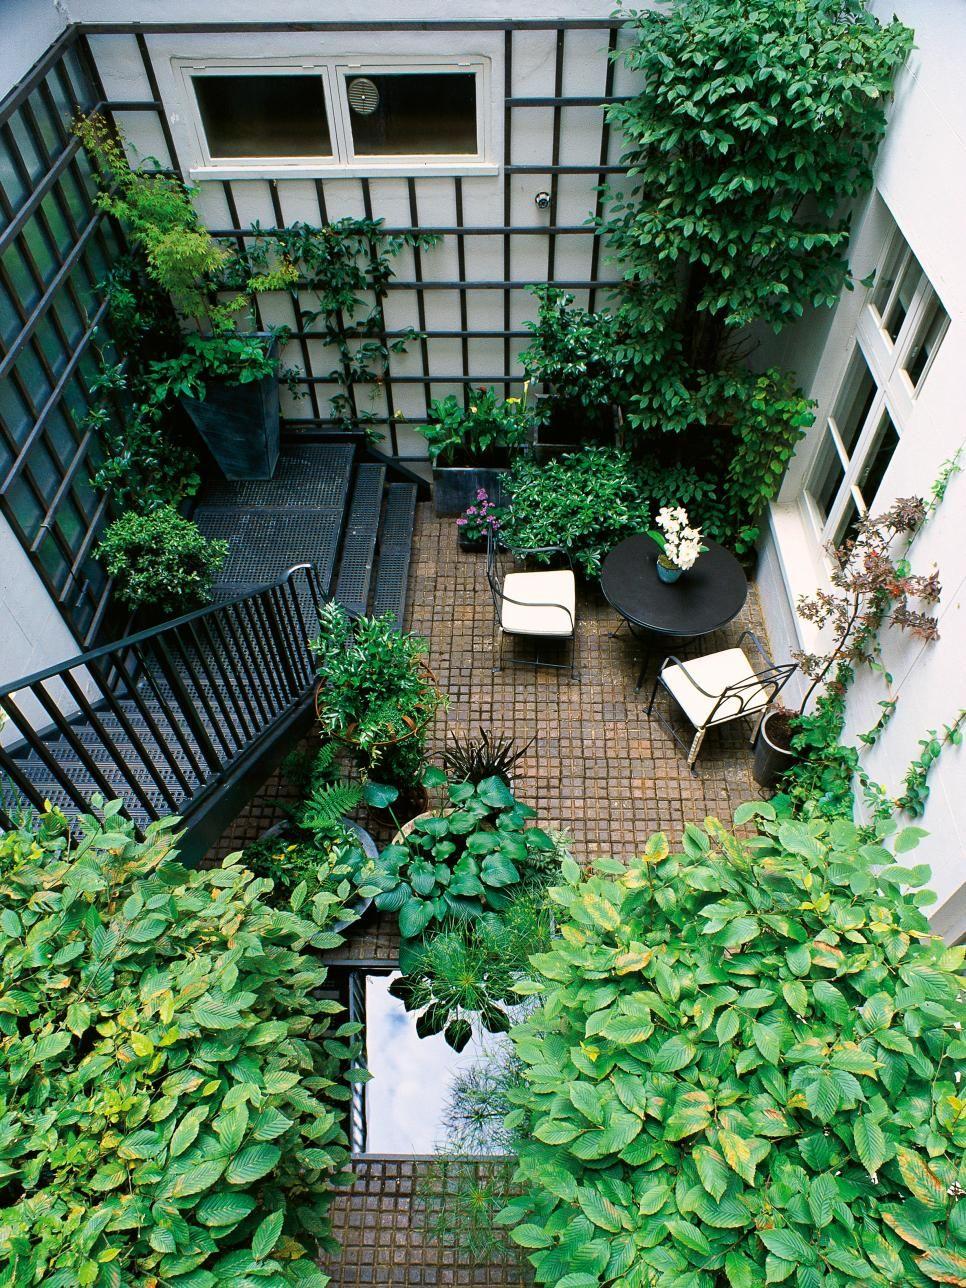 This urban terrace garden features green climbing vines latticed